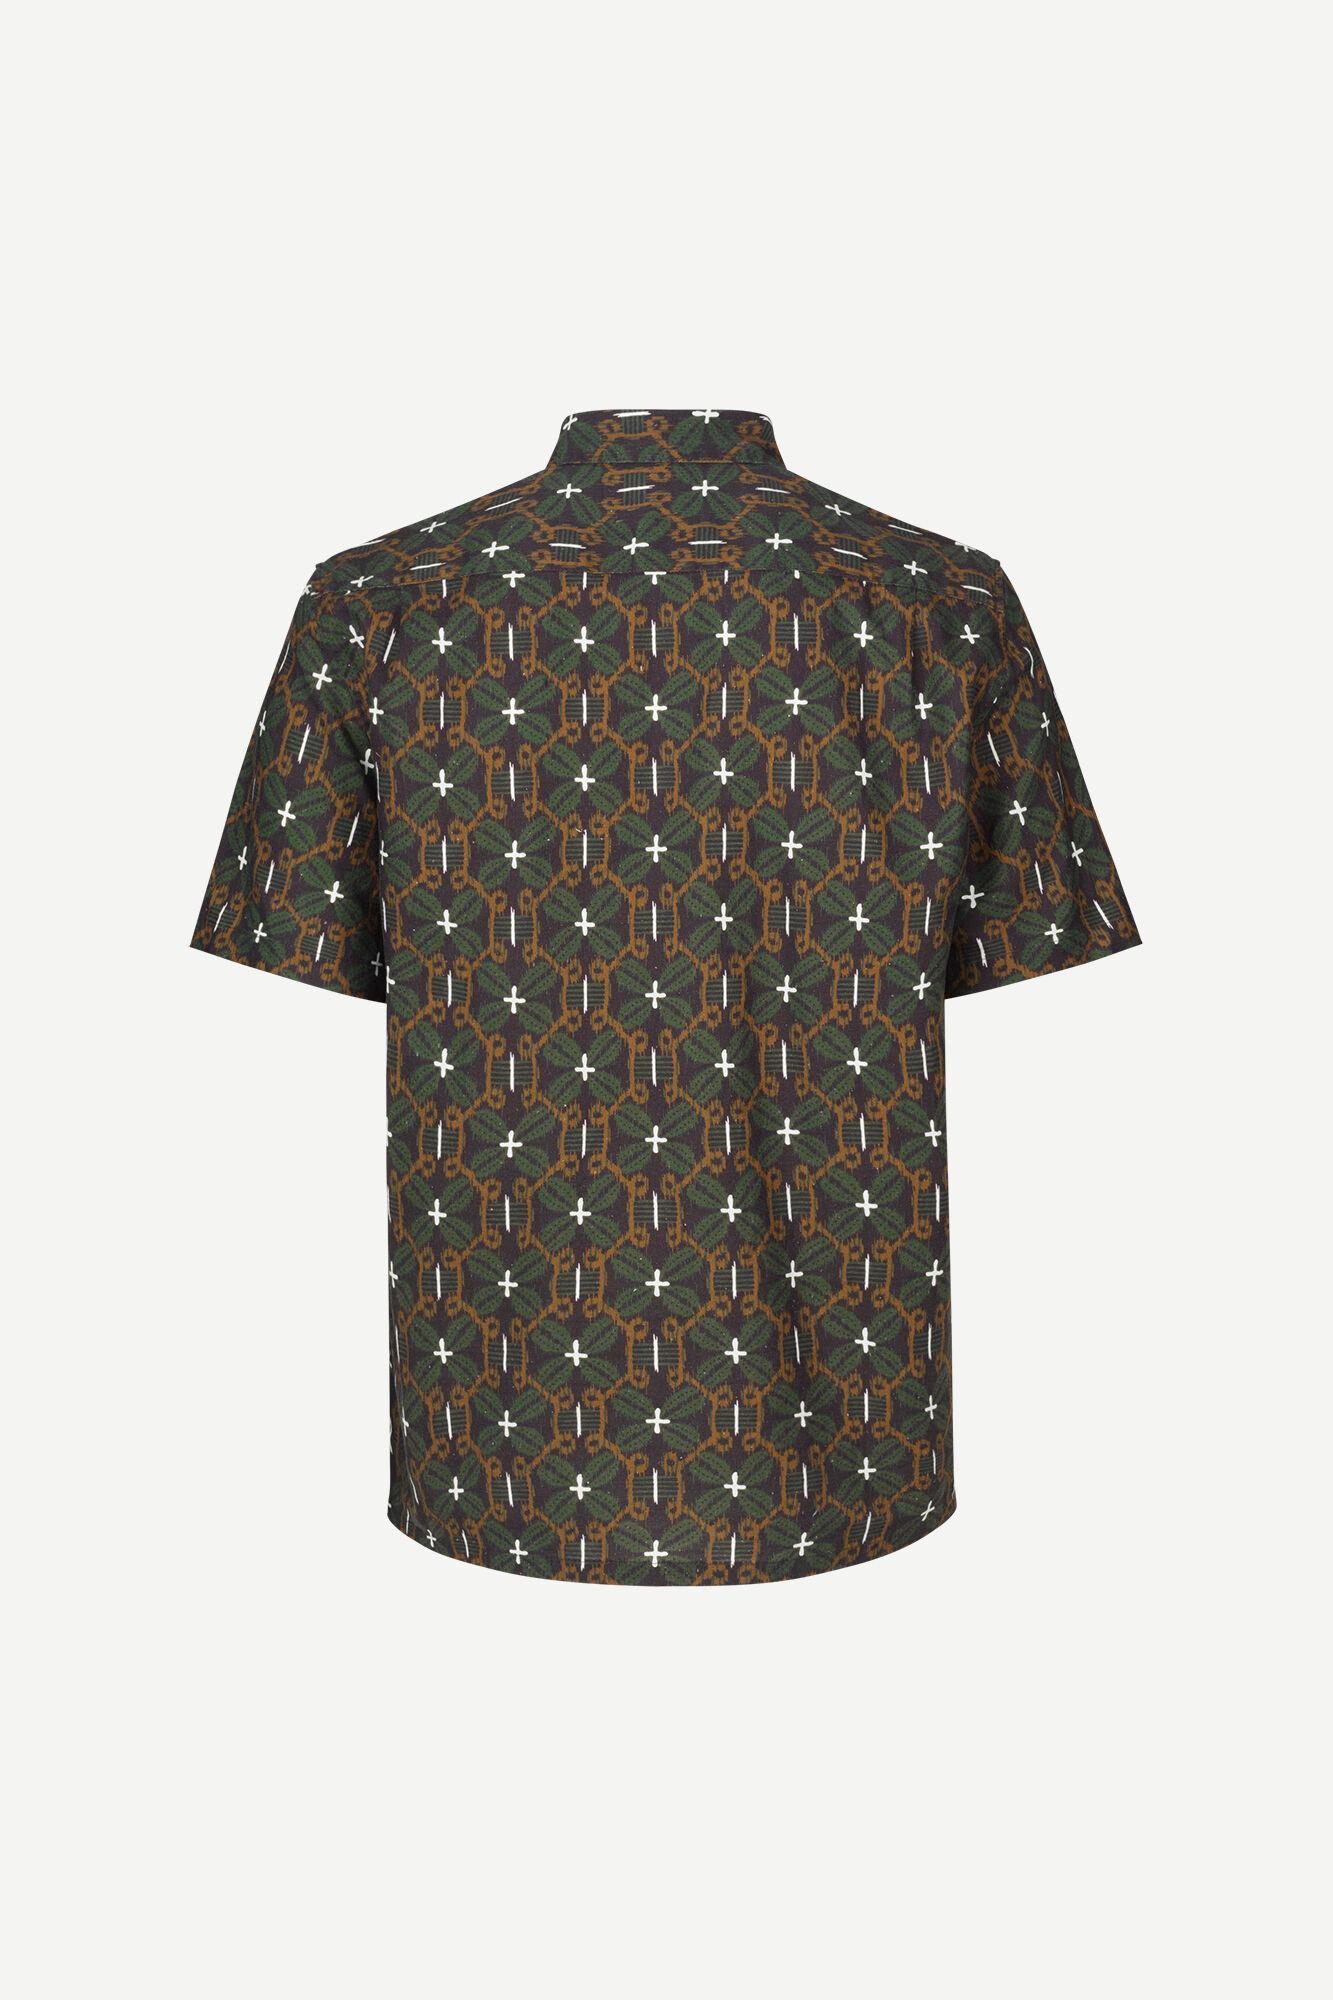 Avan JX shirt aop 6971